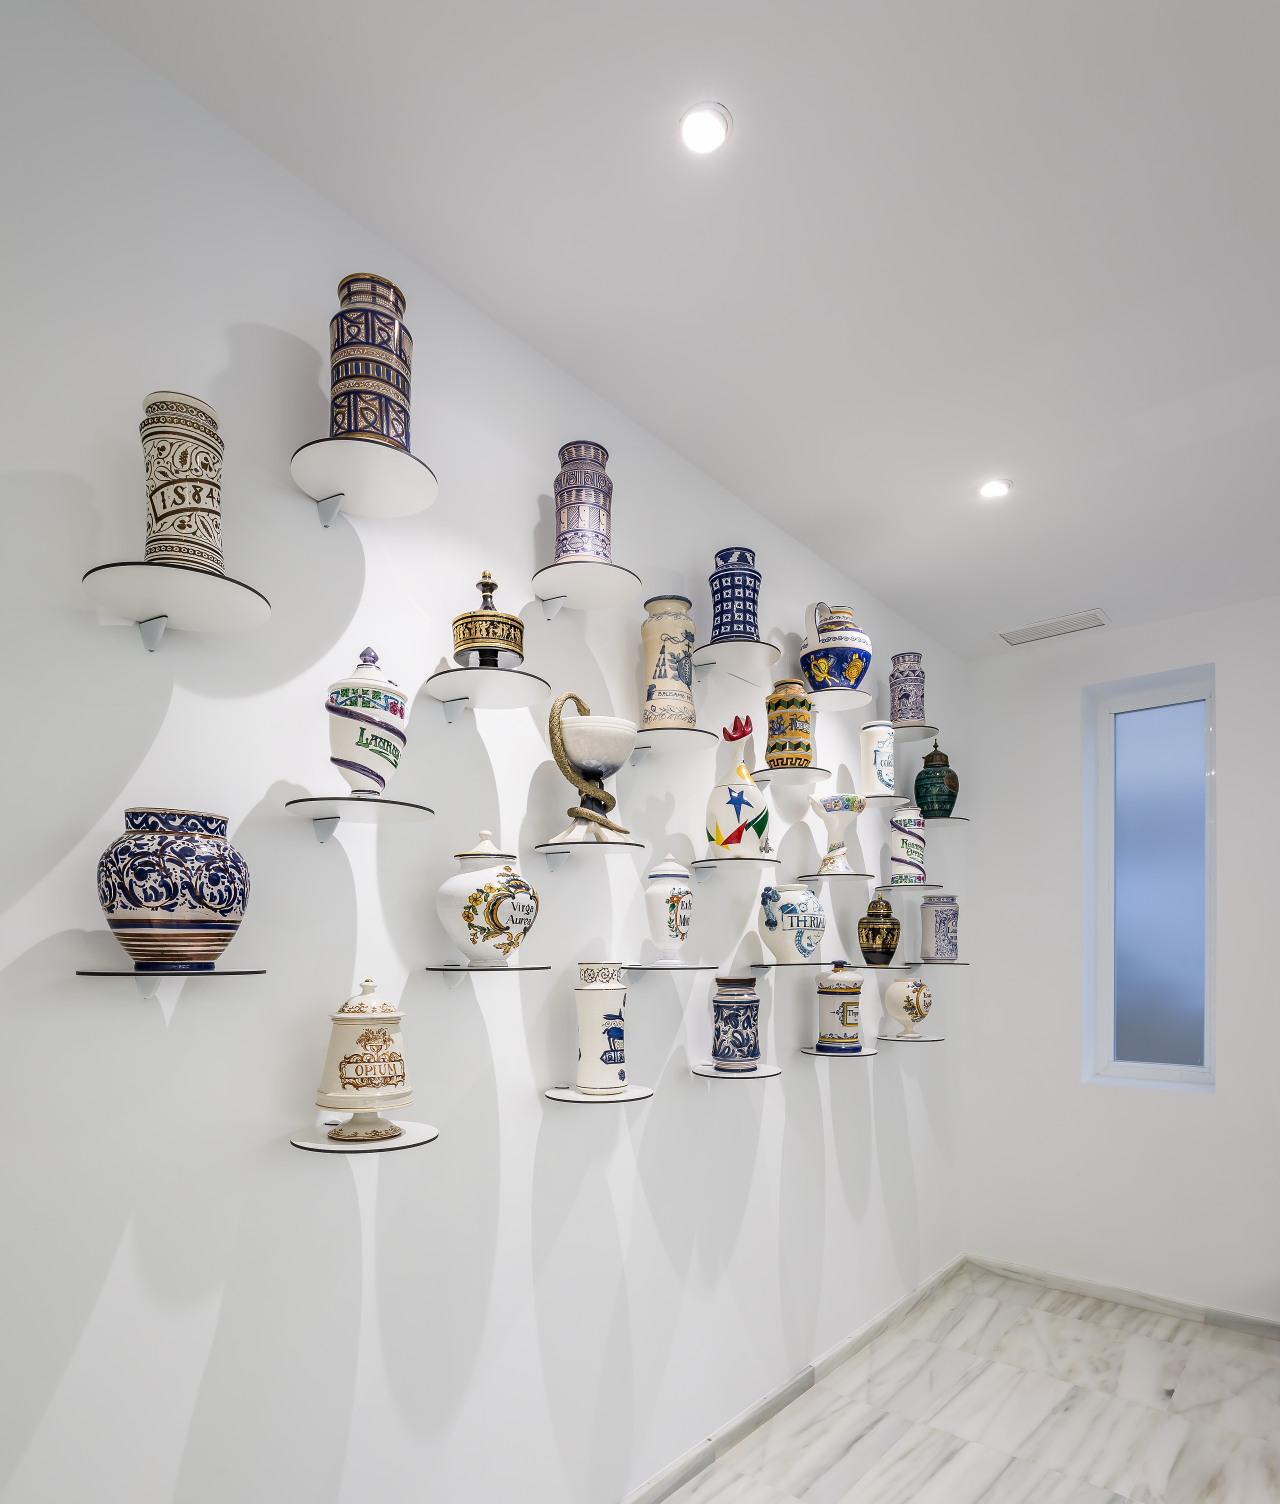 fotografia-arquitectura-valencia-german-cabo-d'estudio-farmacia-sanchis-ribarroja (23)